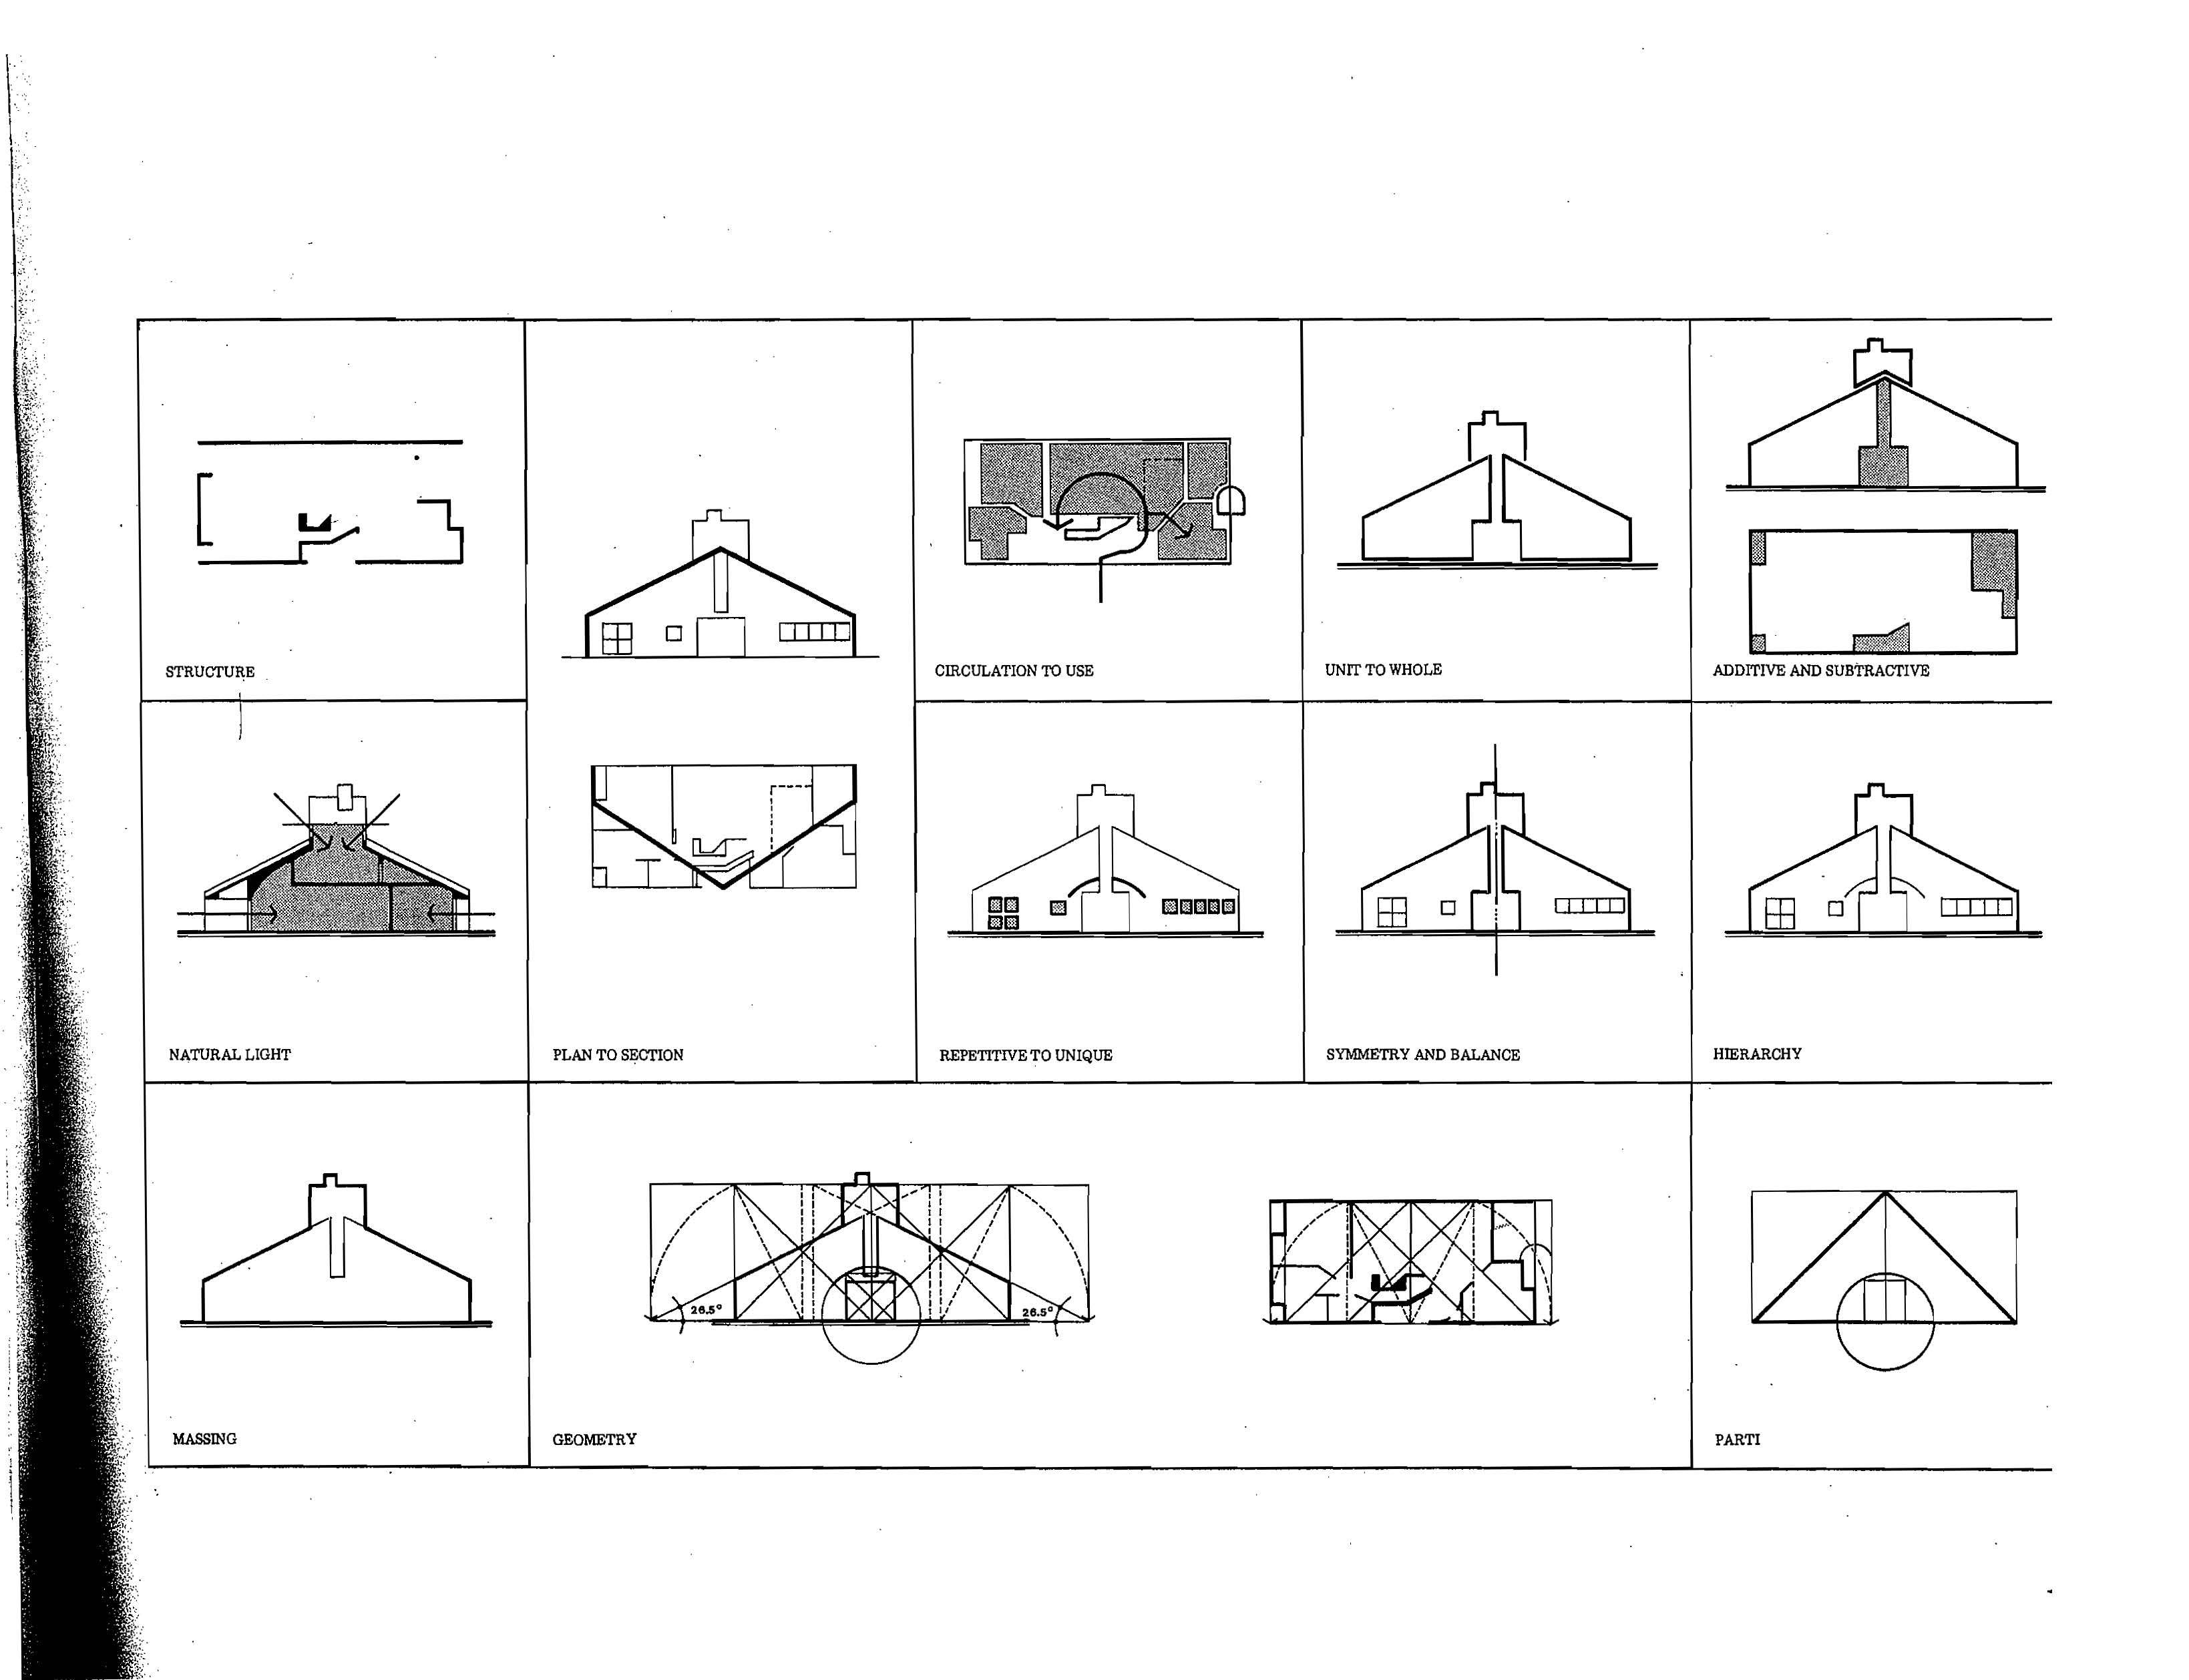 venturi diagram vanna venturi precedents in architecture diagram architecture  vanna venturi precedents in